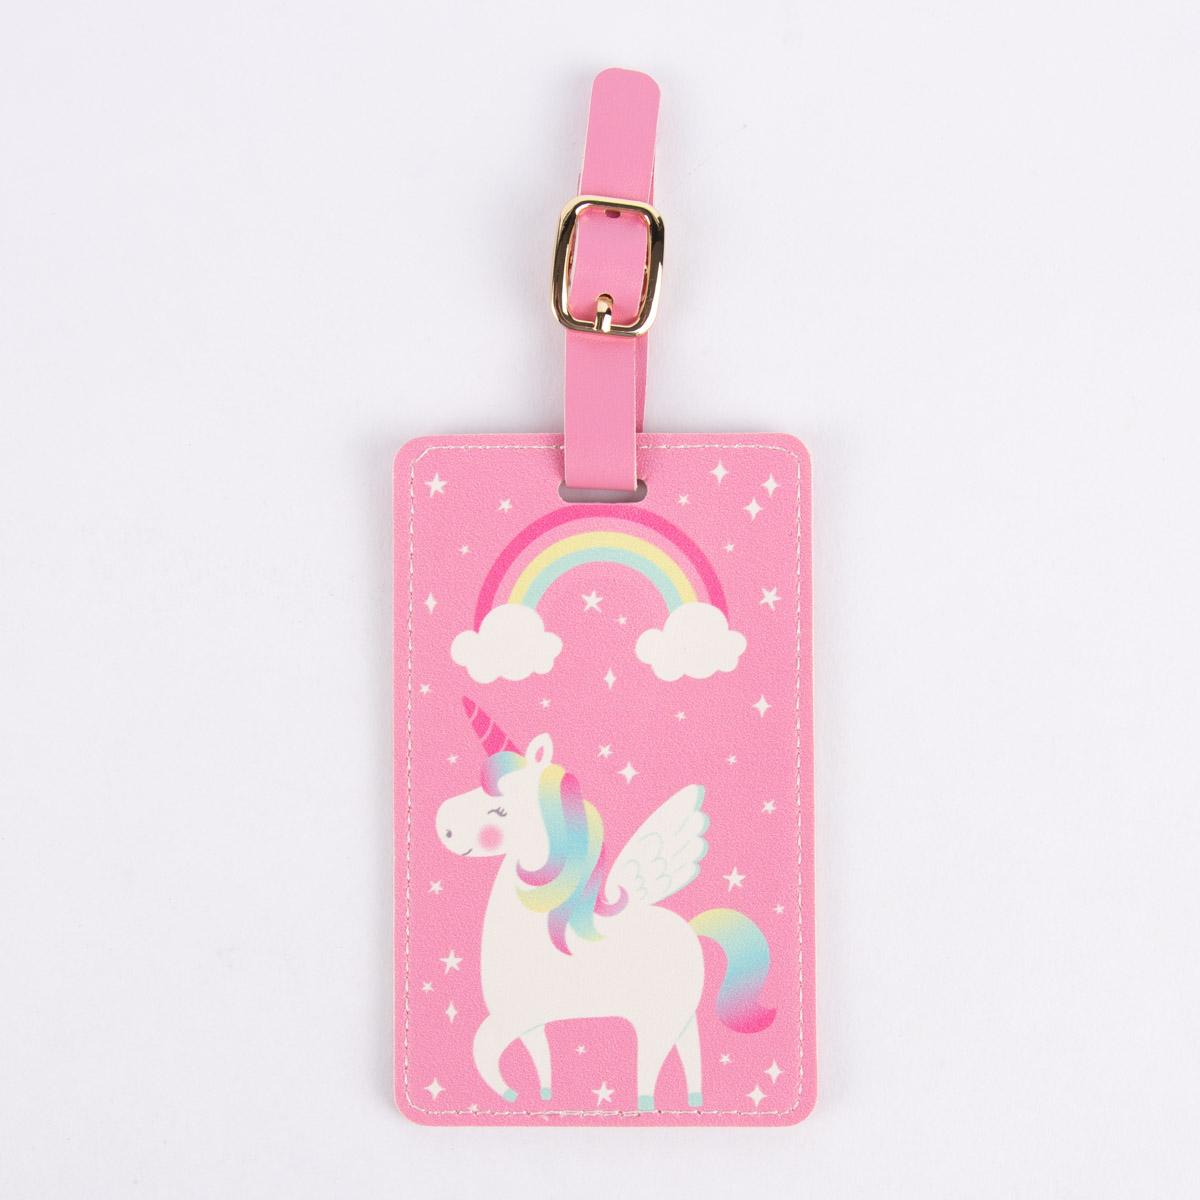 Sass & Belle Gepäckanhänger Einhorn pink bunt 7x11,5cm